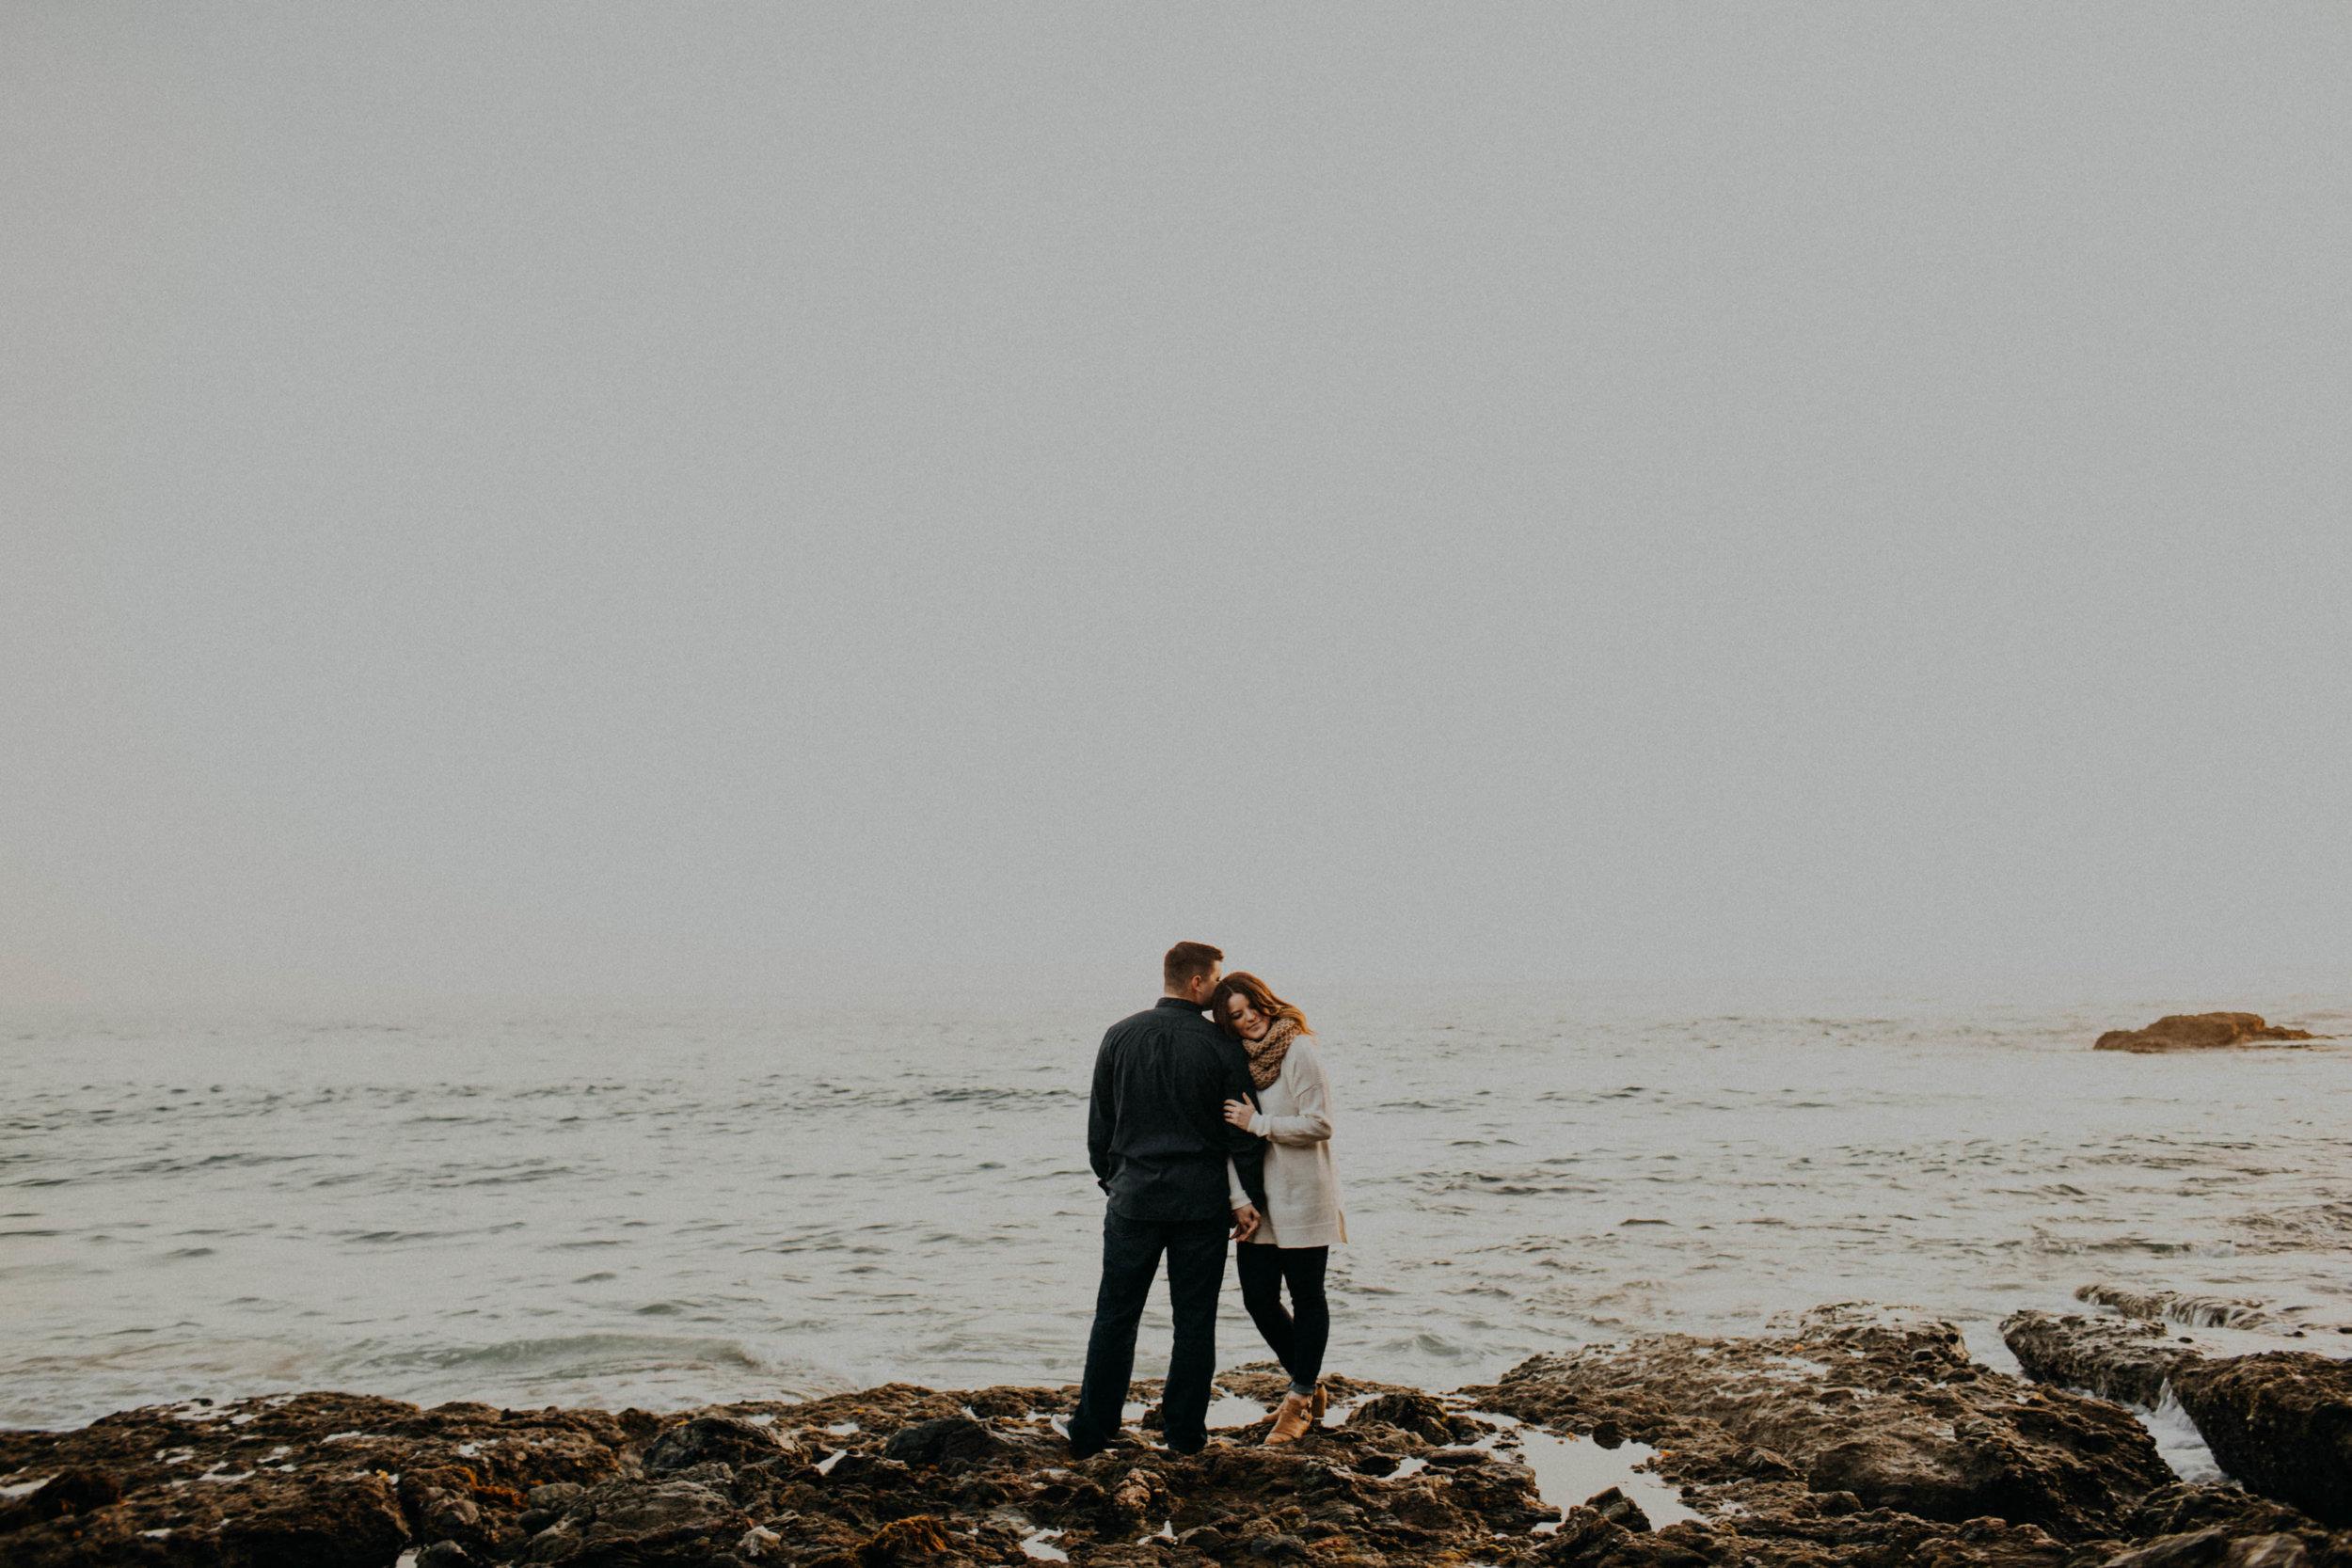 Laguna Beach Engagement Photos Kate and Curtis Grace E. Jones Photography109.jpg